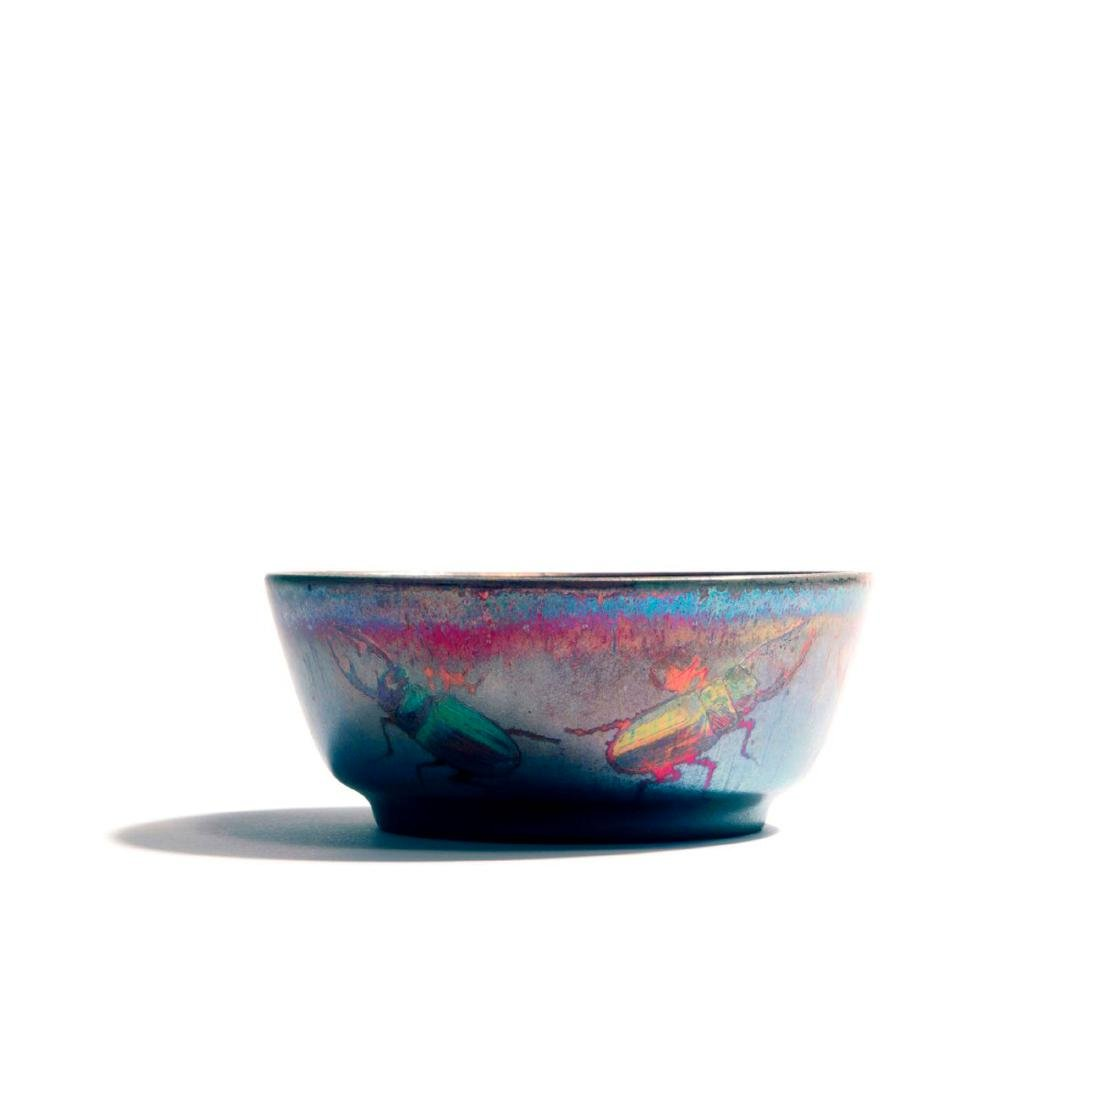 'Stag Beetle' bowl, c. 1900